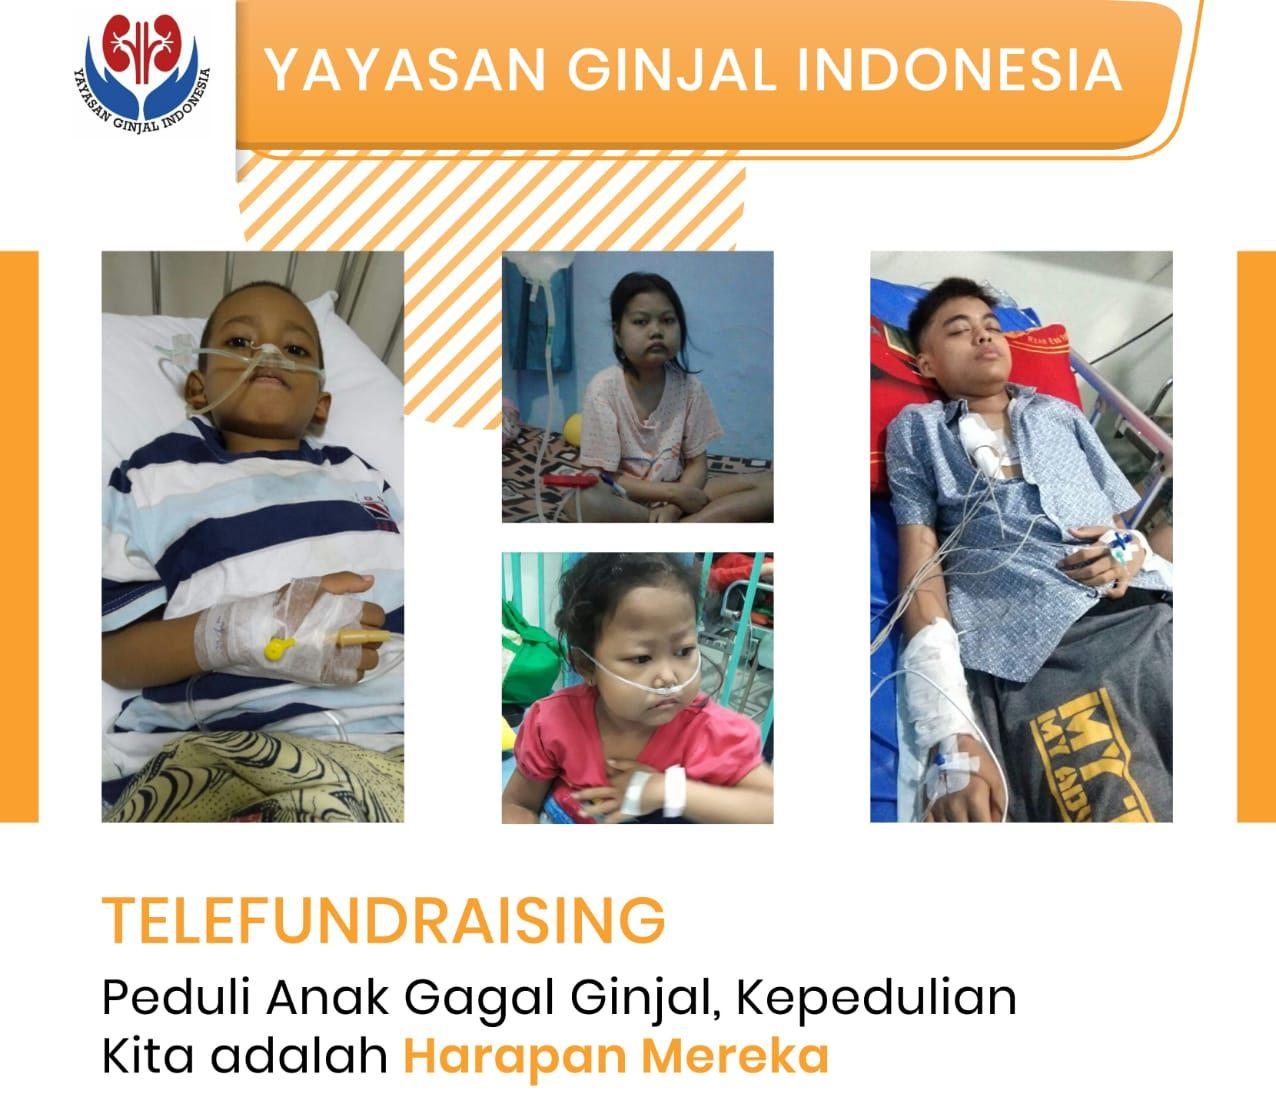 telefundraising yagin